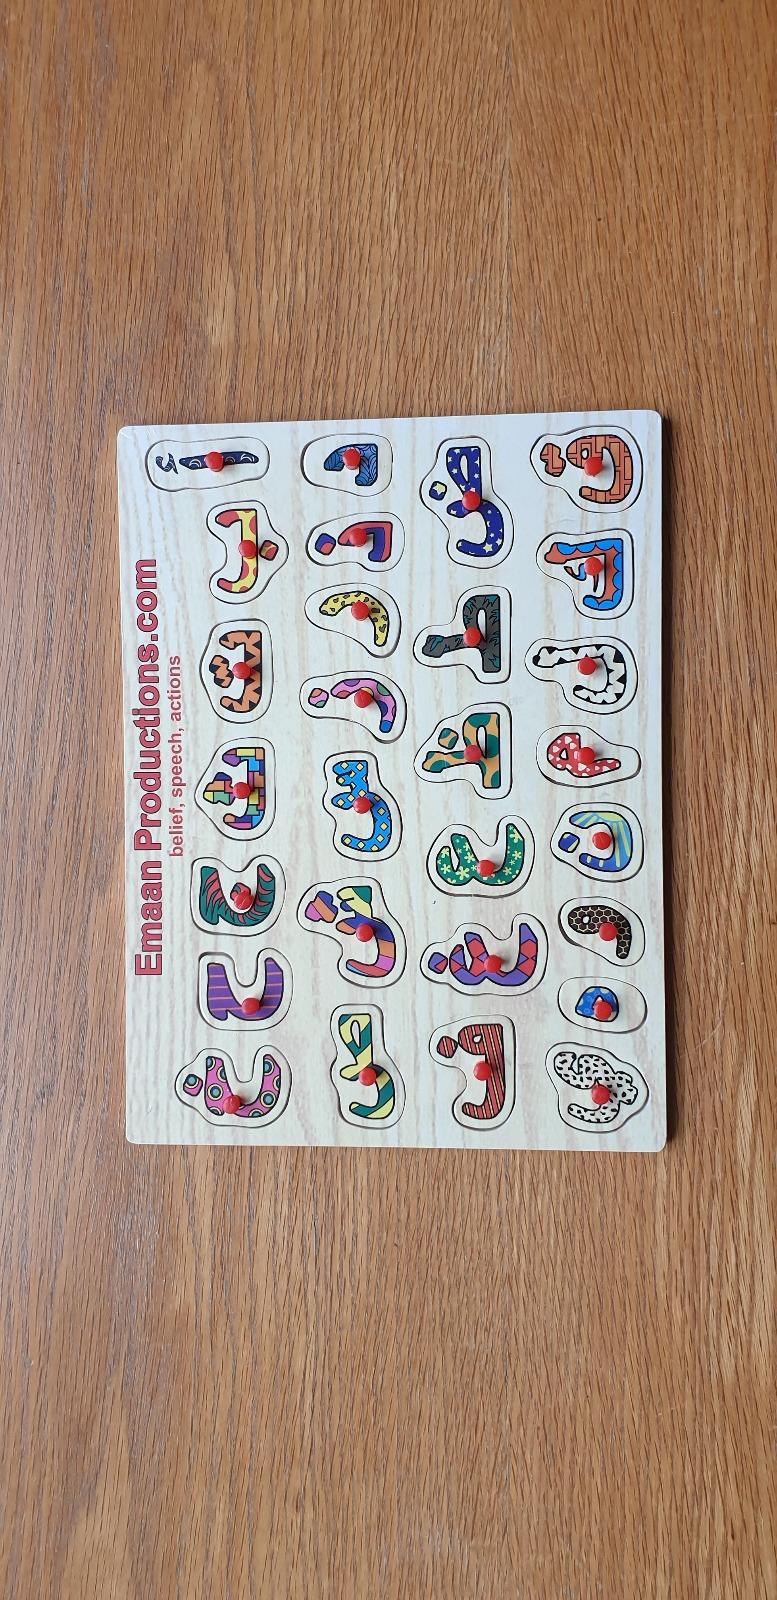 Little Ummah - Arabic Jigsaw Puzzle